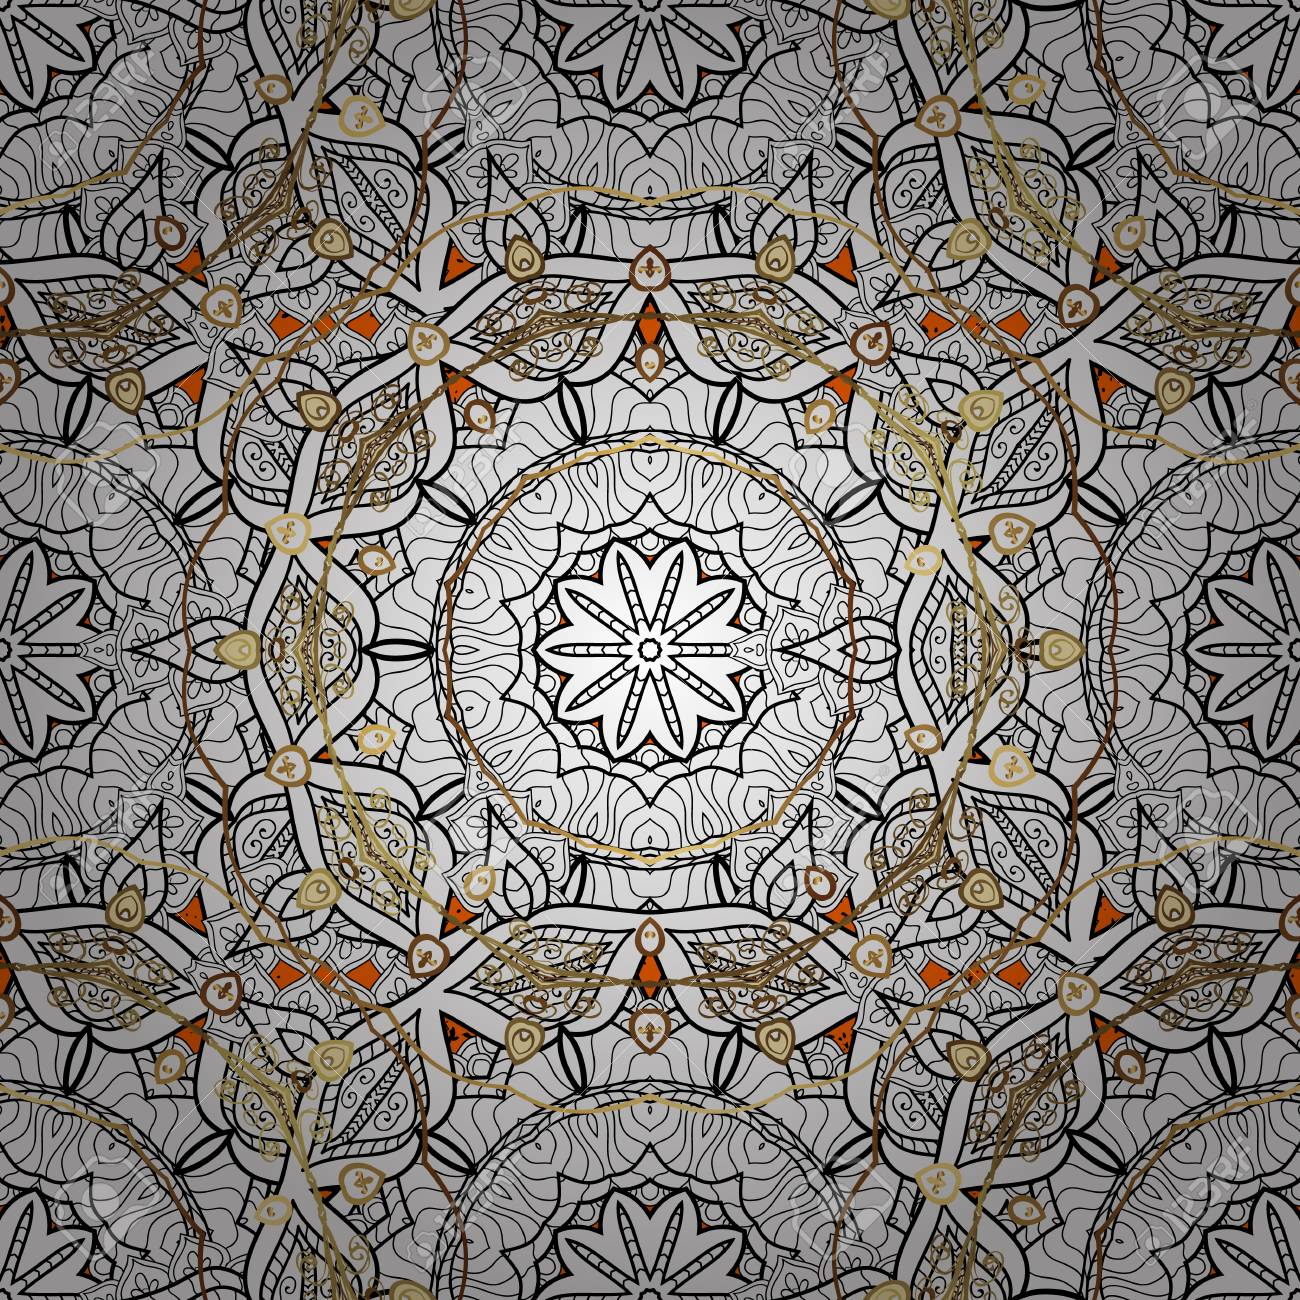 Royal luxury white baroque damask vintage  Vector pattern background